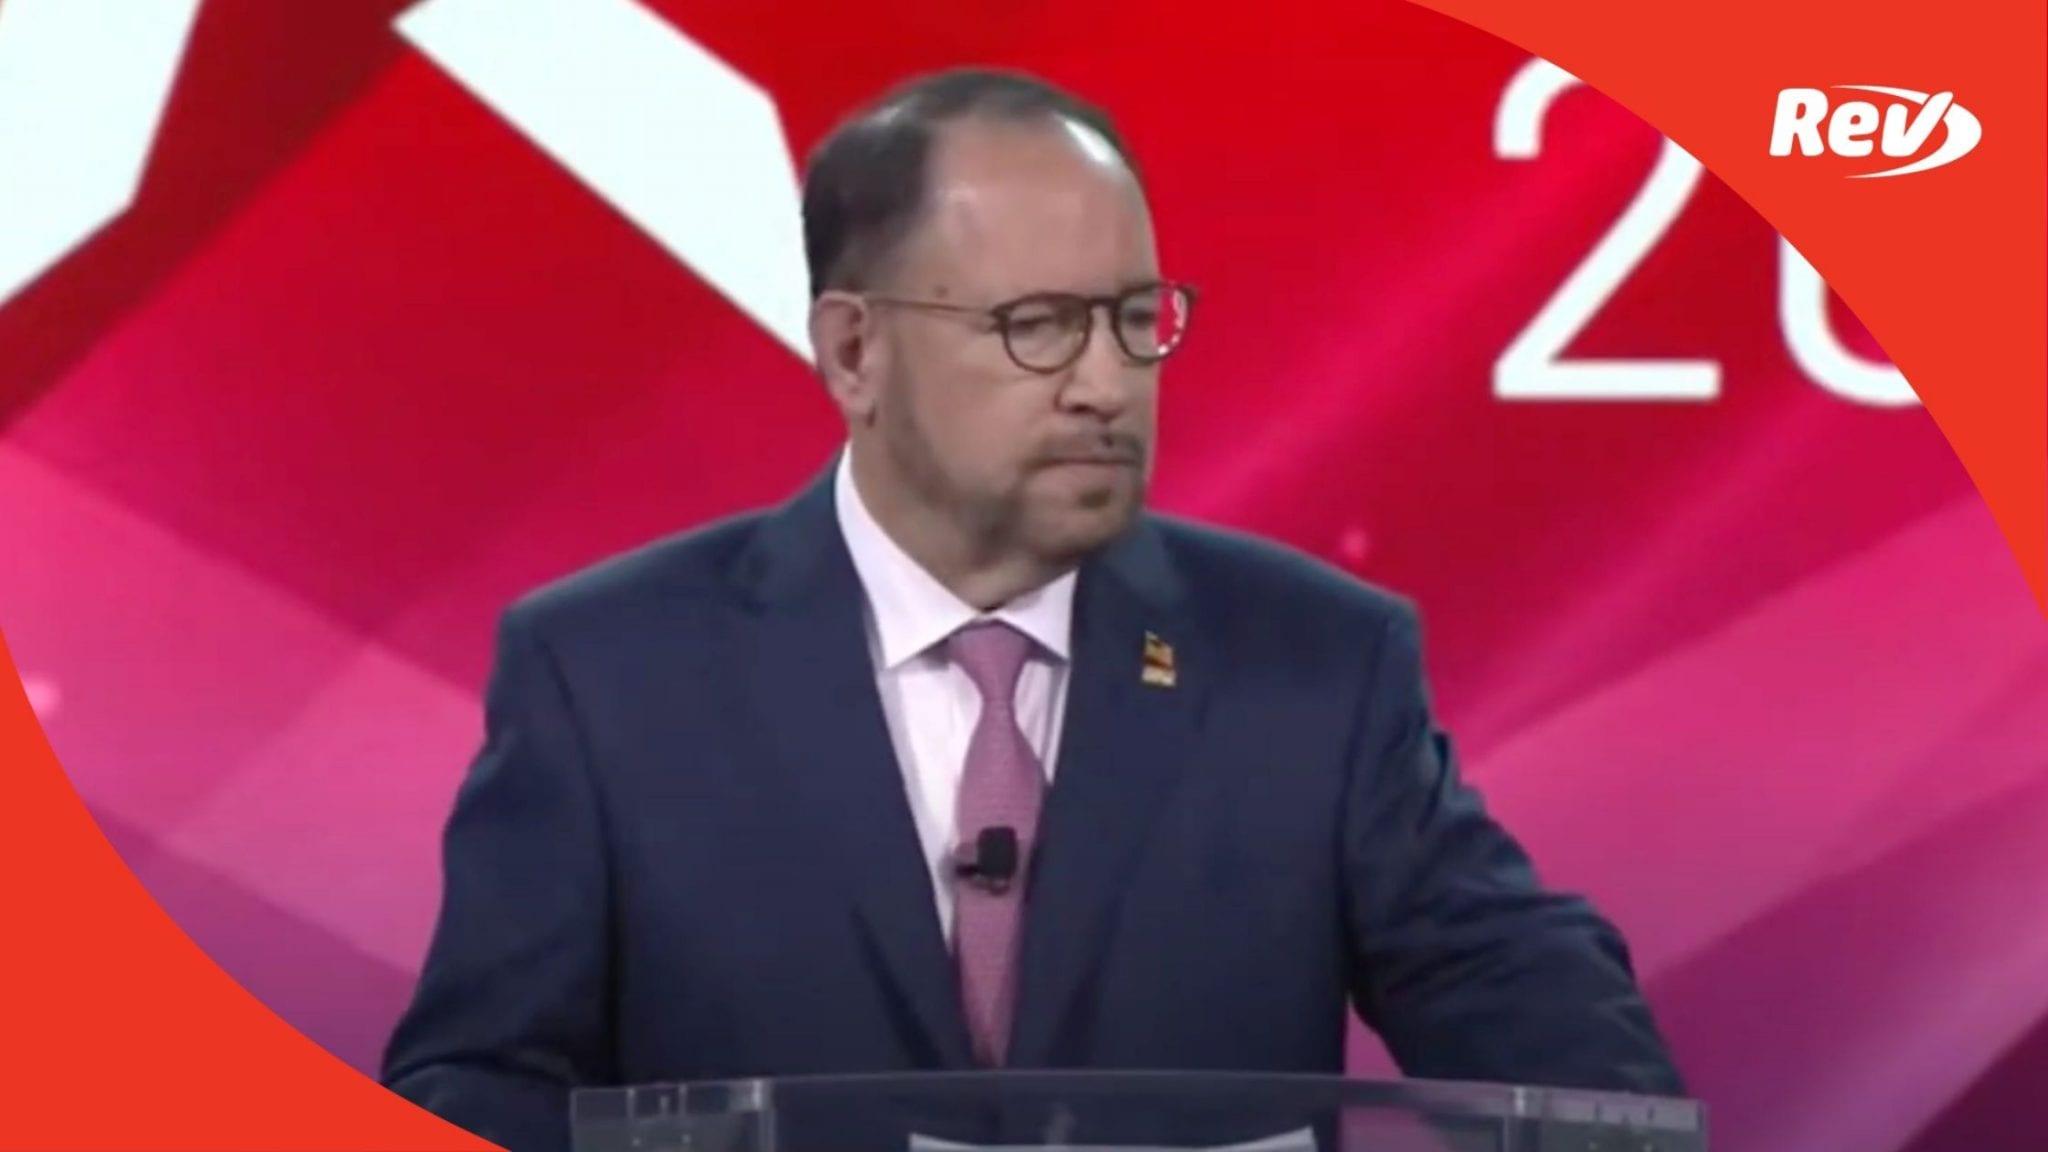 Goya Foods CEO Speech at CPAC